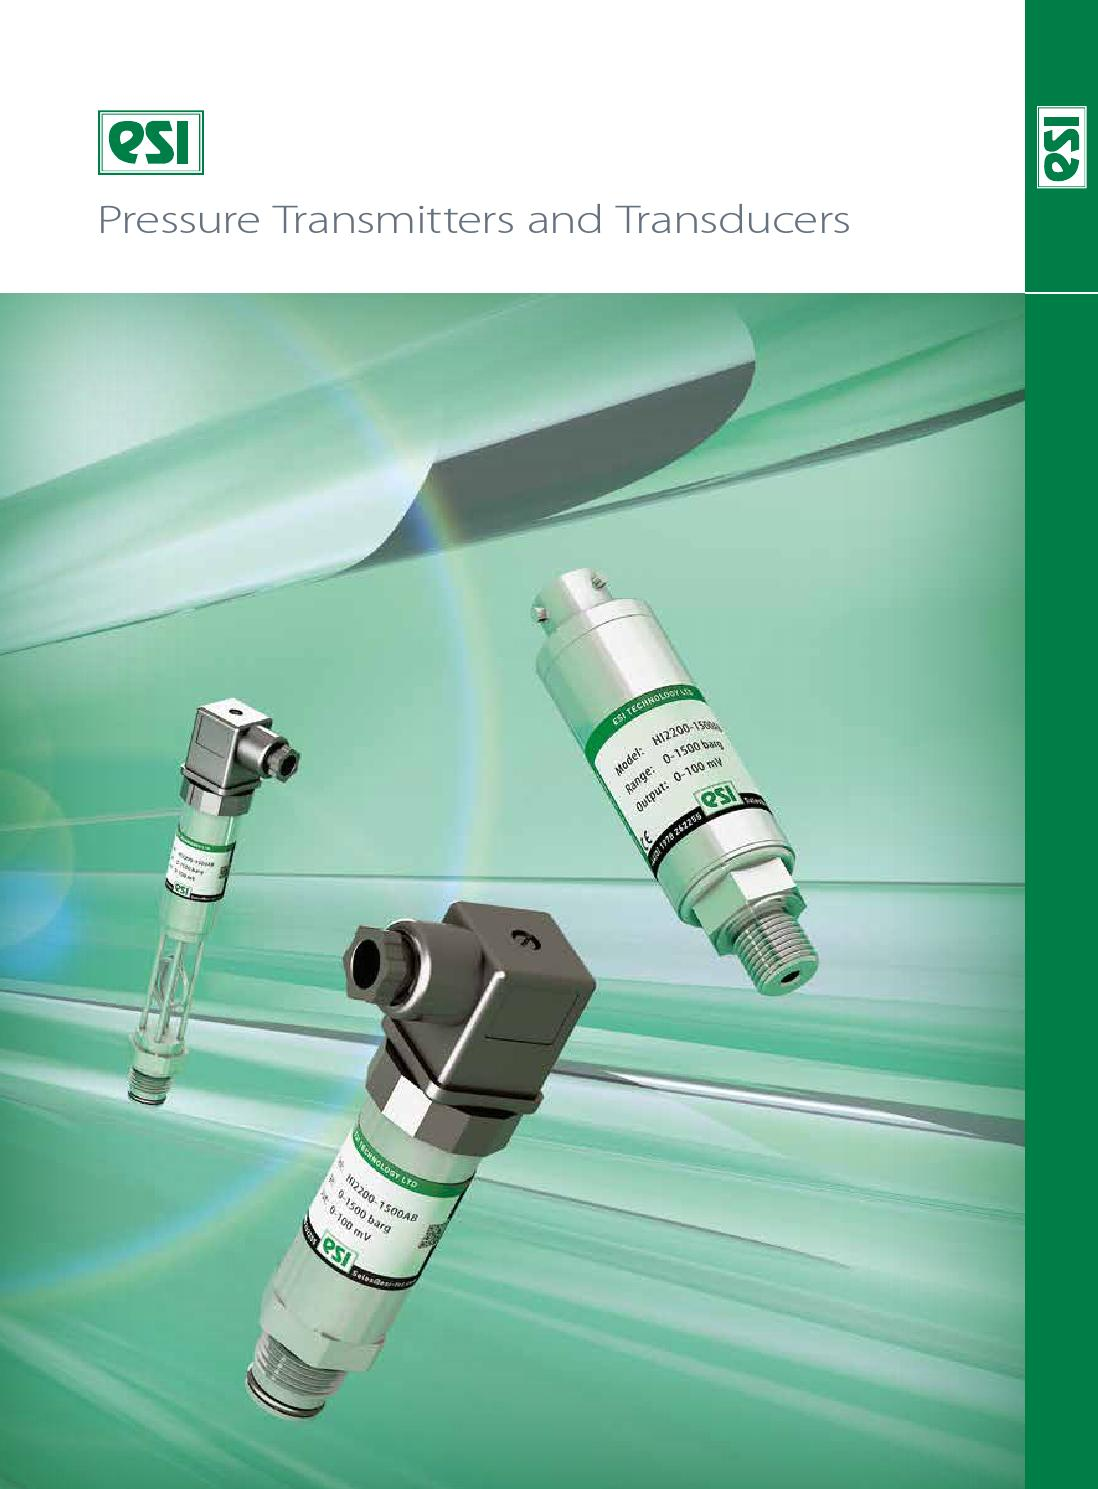 Esi Pressure Transmitters And Transducers By Jet Digital Media Ltd Ic Power Pm8005 002 Issuu